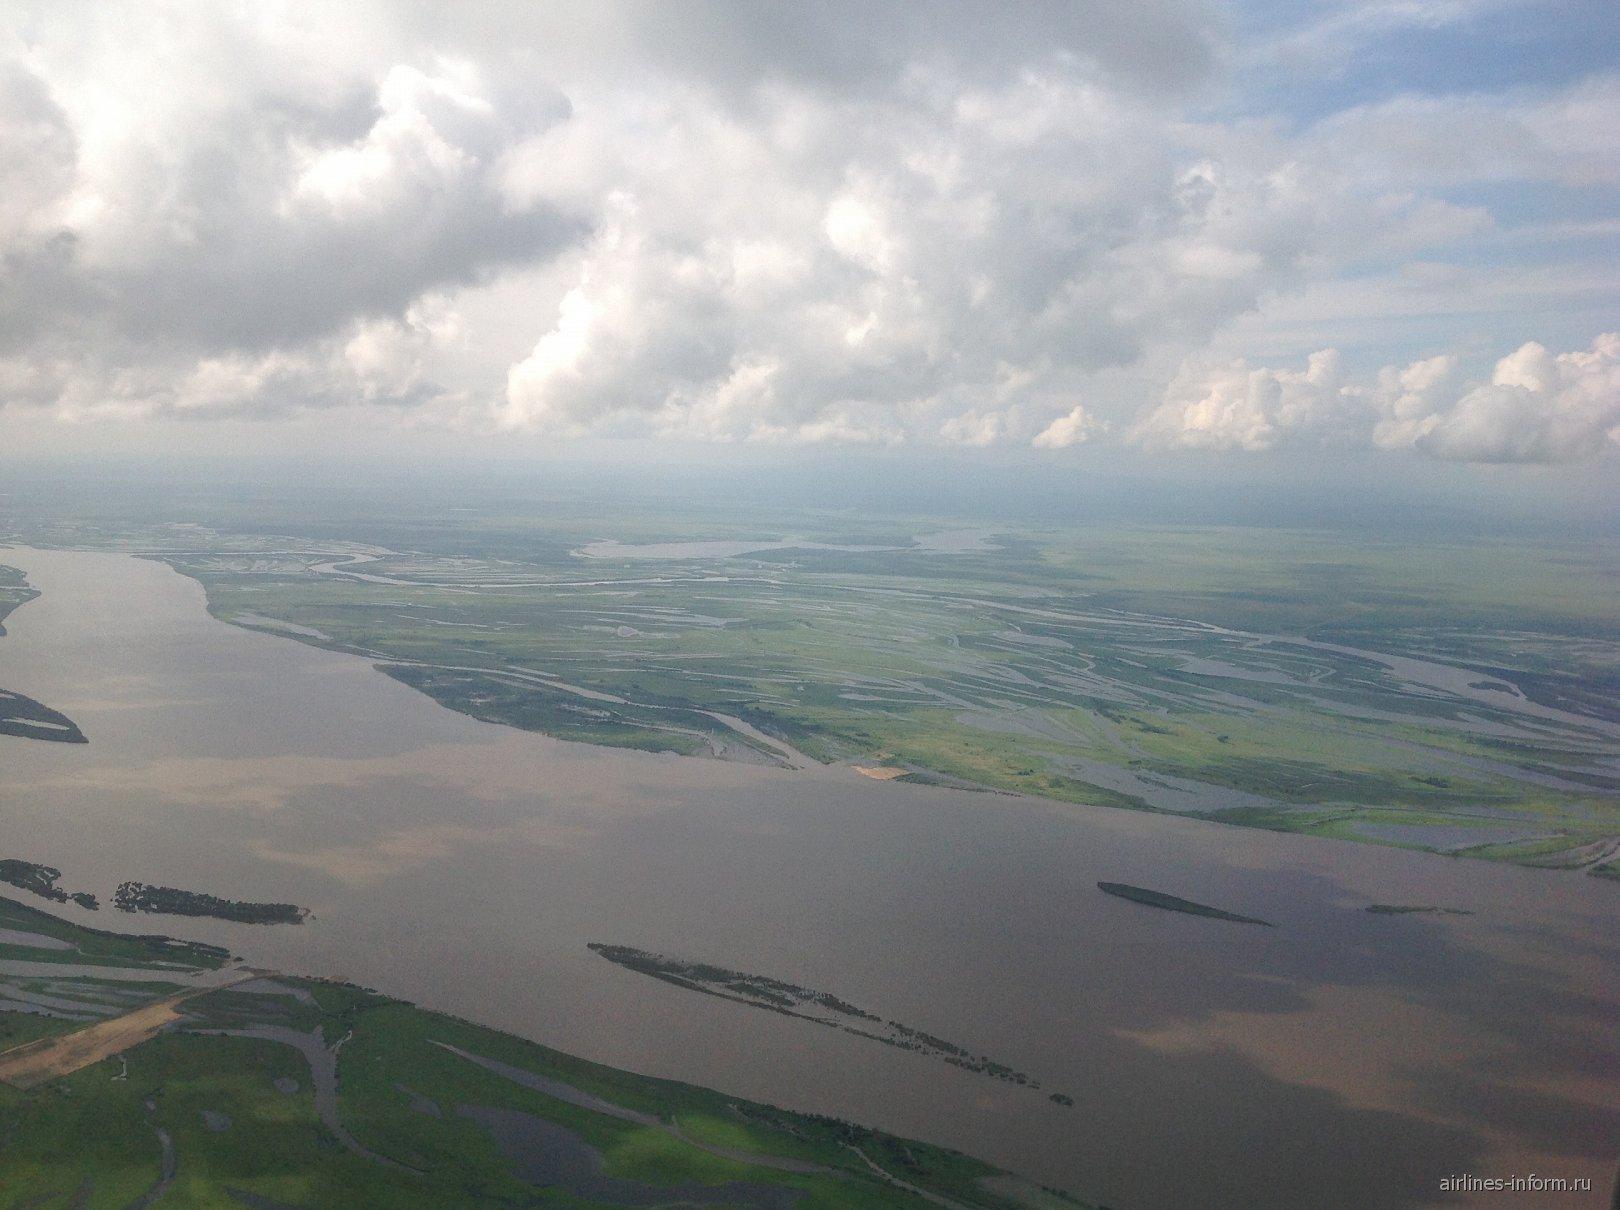 Вид на реку Амур при подлете к Хабаровску